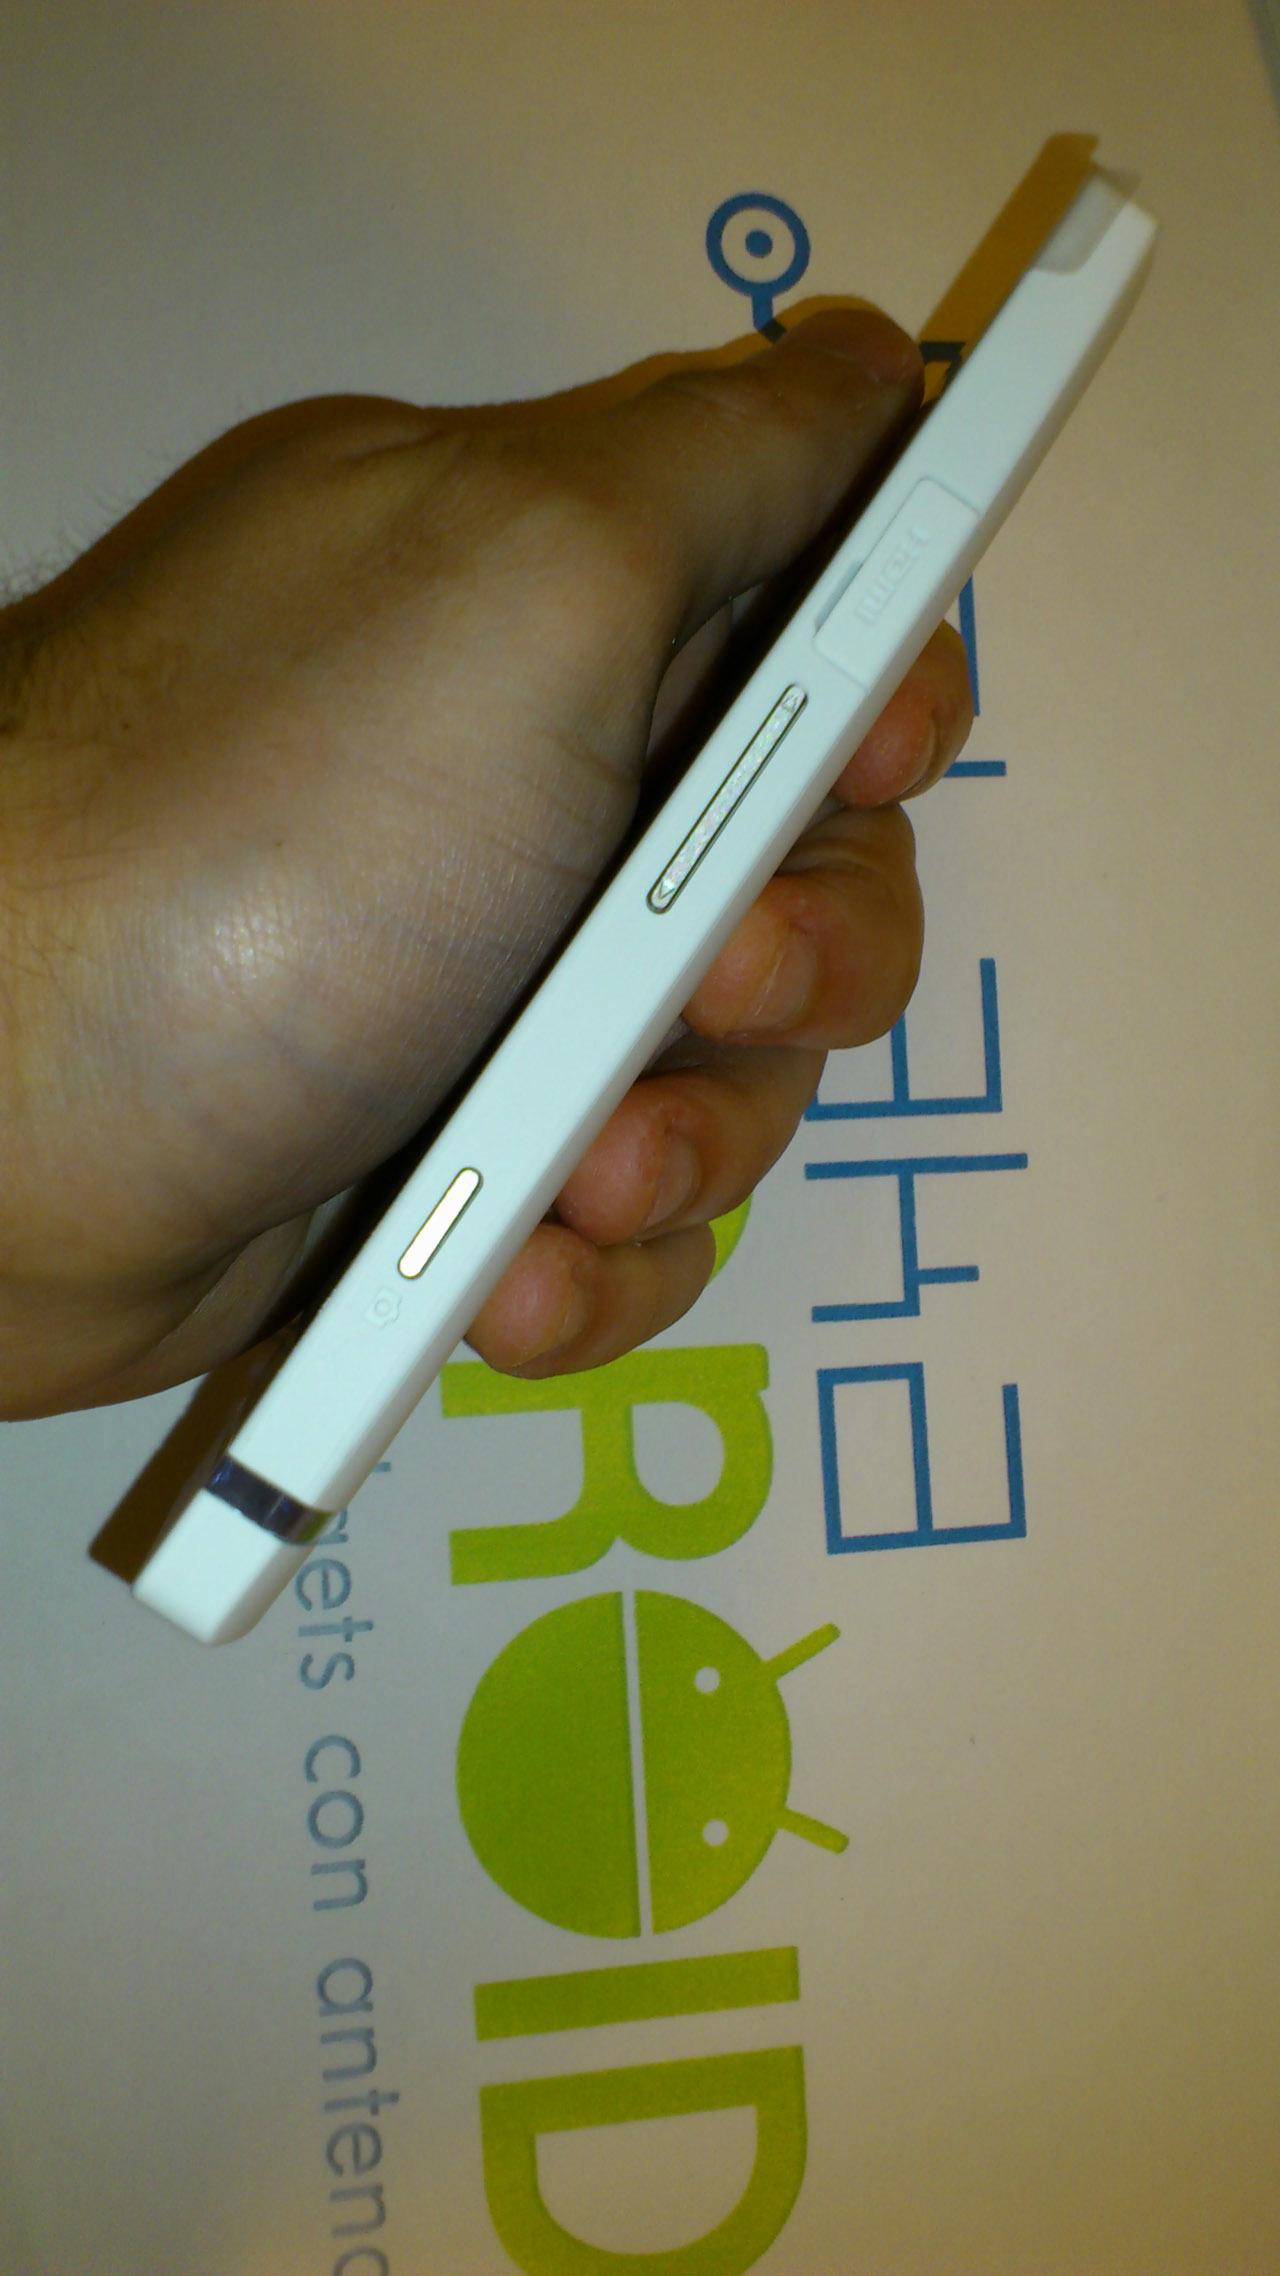 Foto de Sony Xperia S, análisis a fondo (41/50)